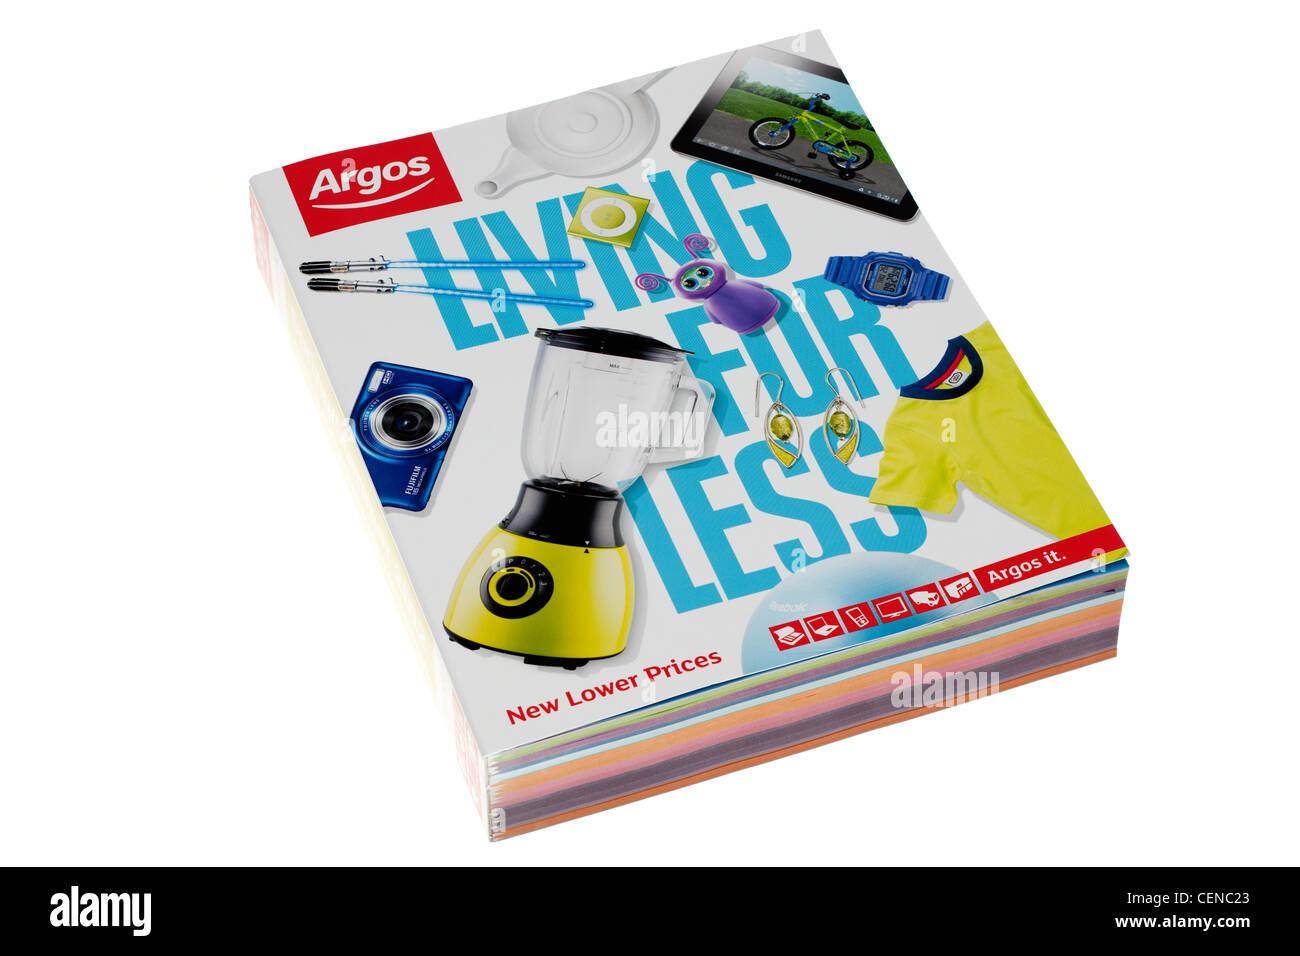 Argos Catalogue Stock Photos & Argos Catalogue Stock Images - Alamy